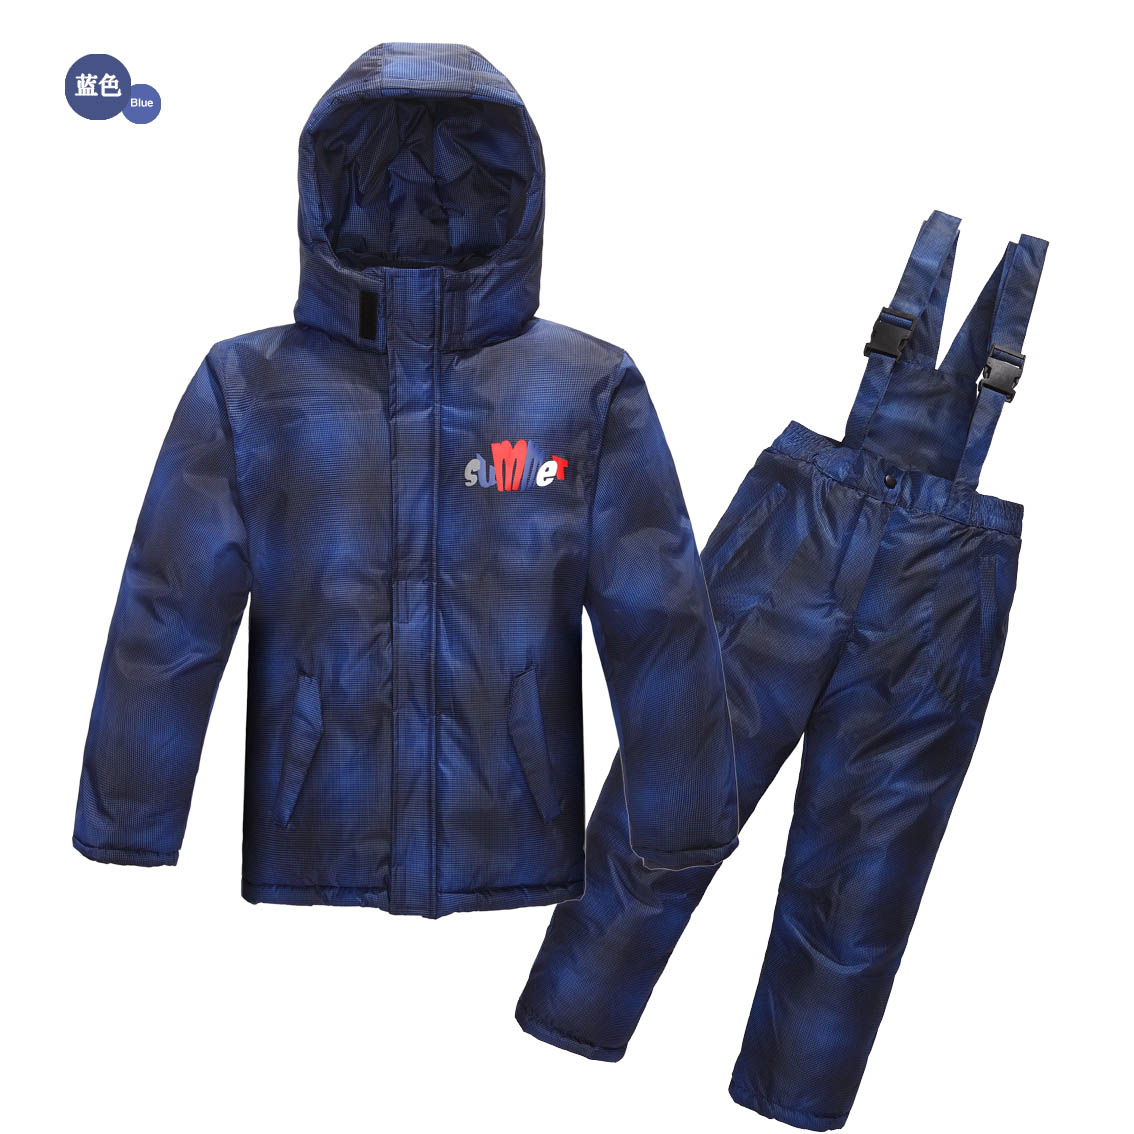 Ski Suit One set  Ski Coat for Kids